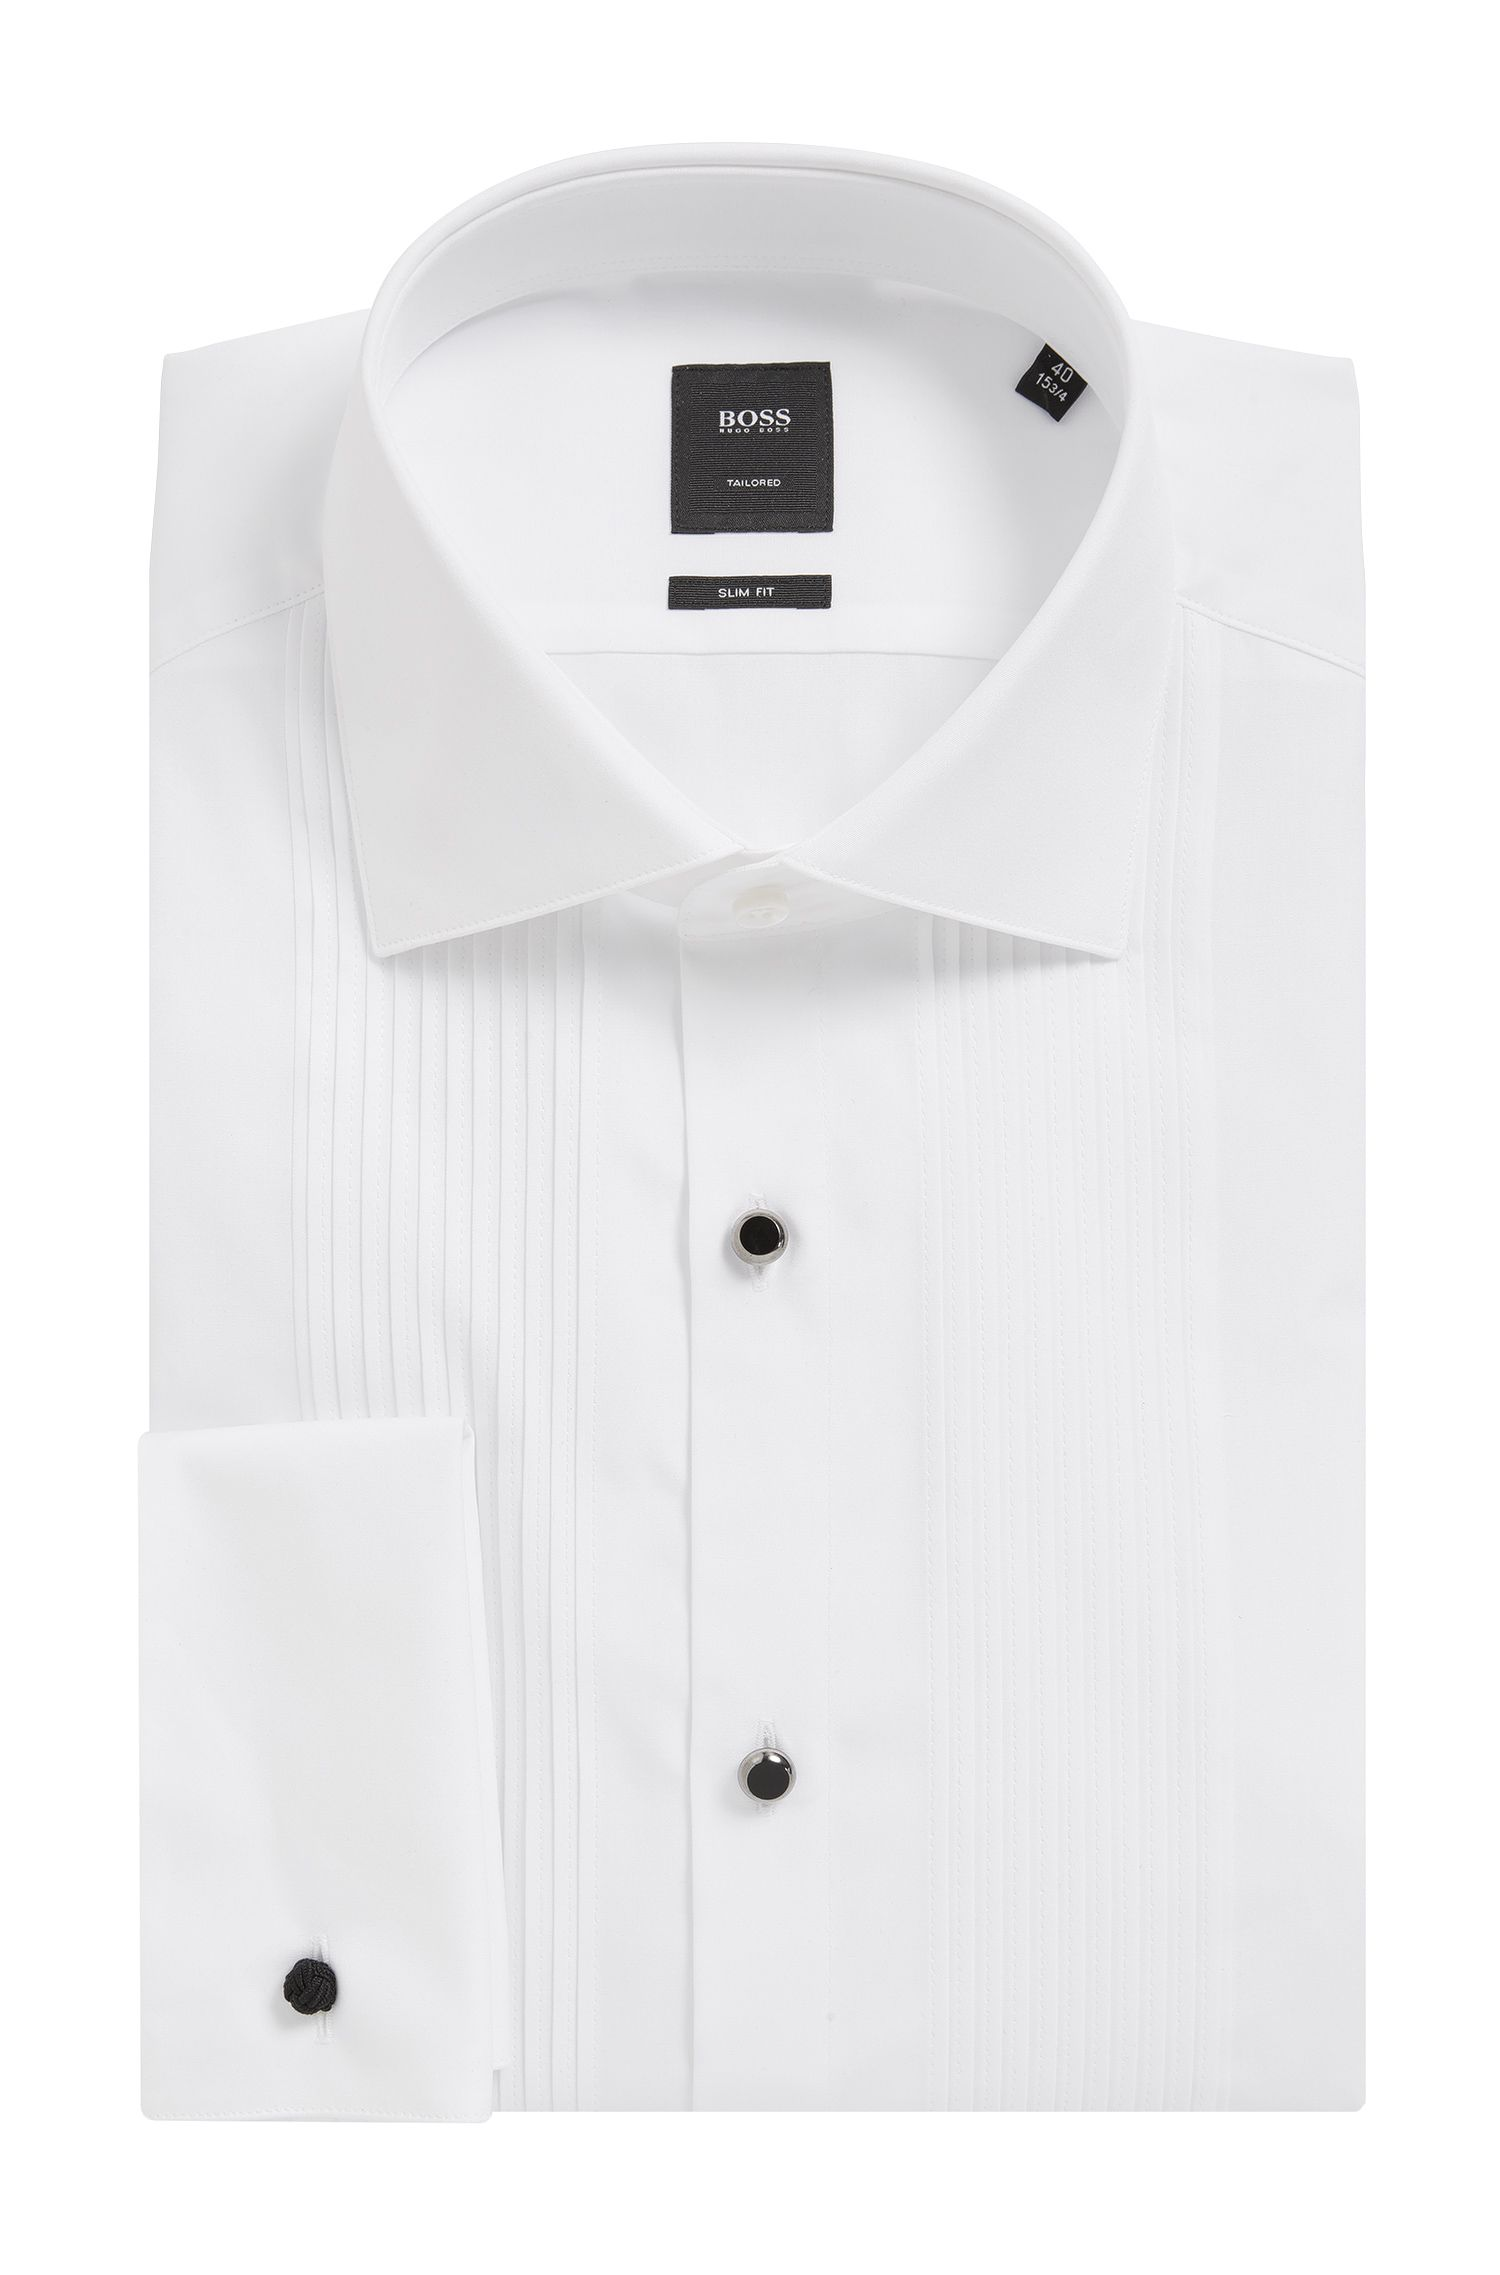 'T-Cameron' | Slim Fit, 2-Ply Egyptian Cotton Dress Shirt